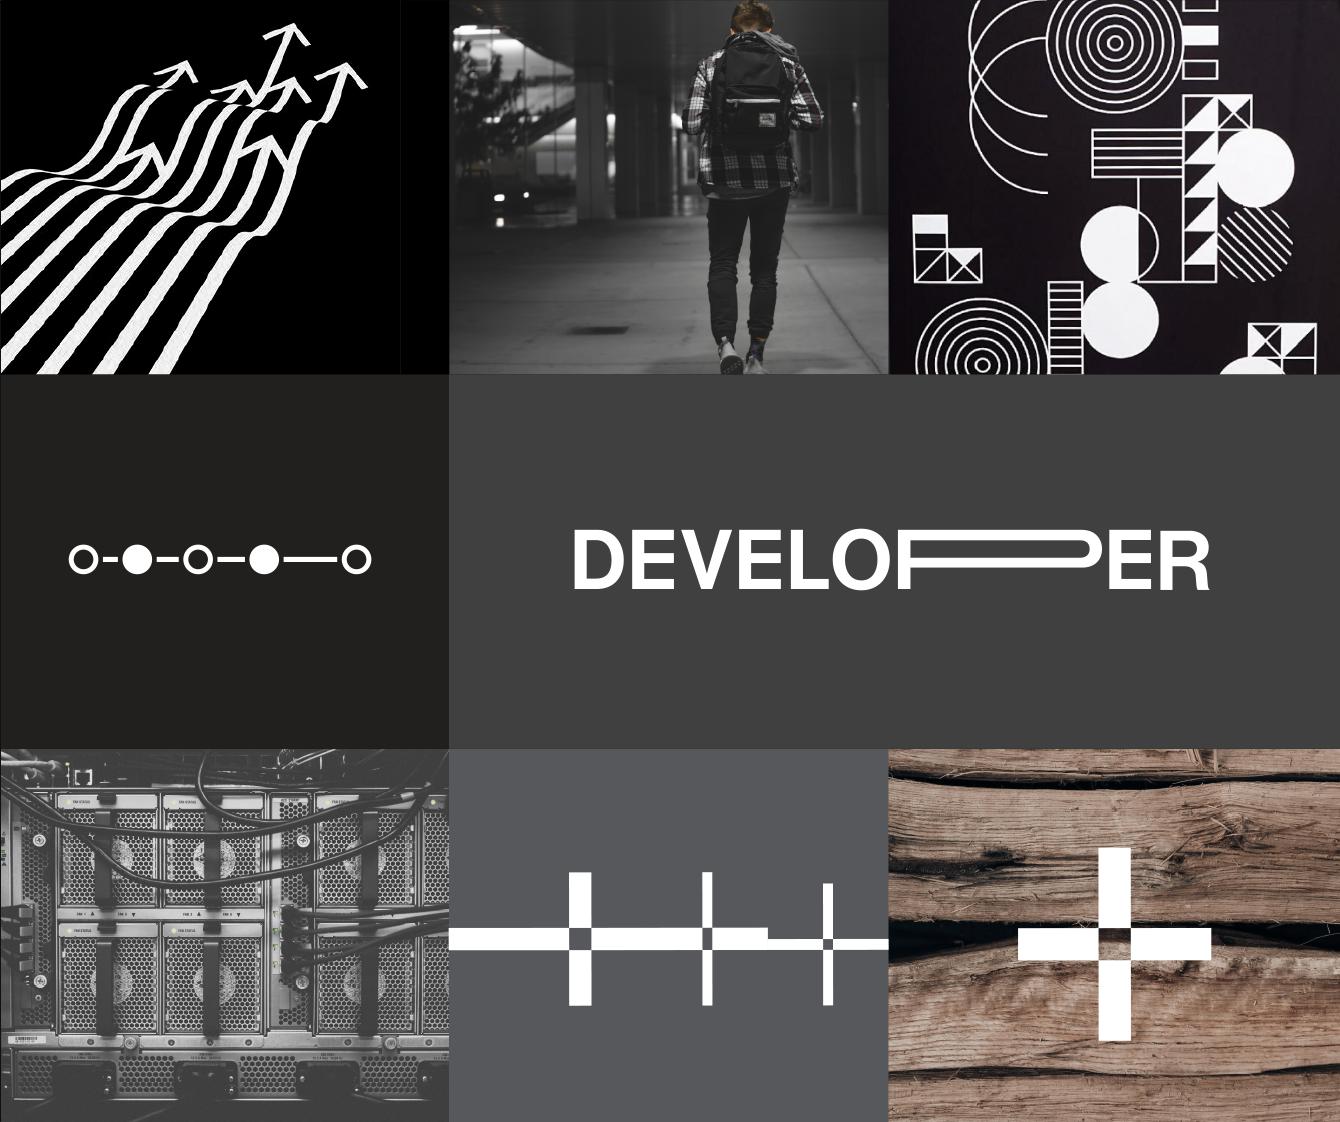 Docusign_Dev3_2x.png